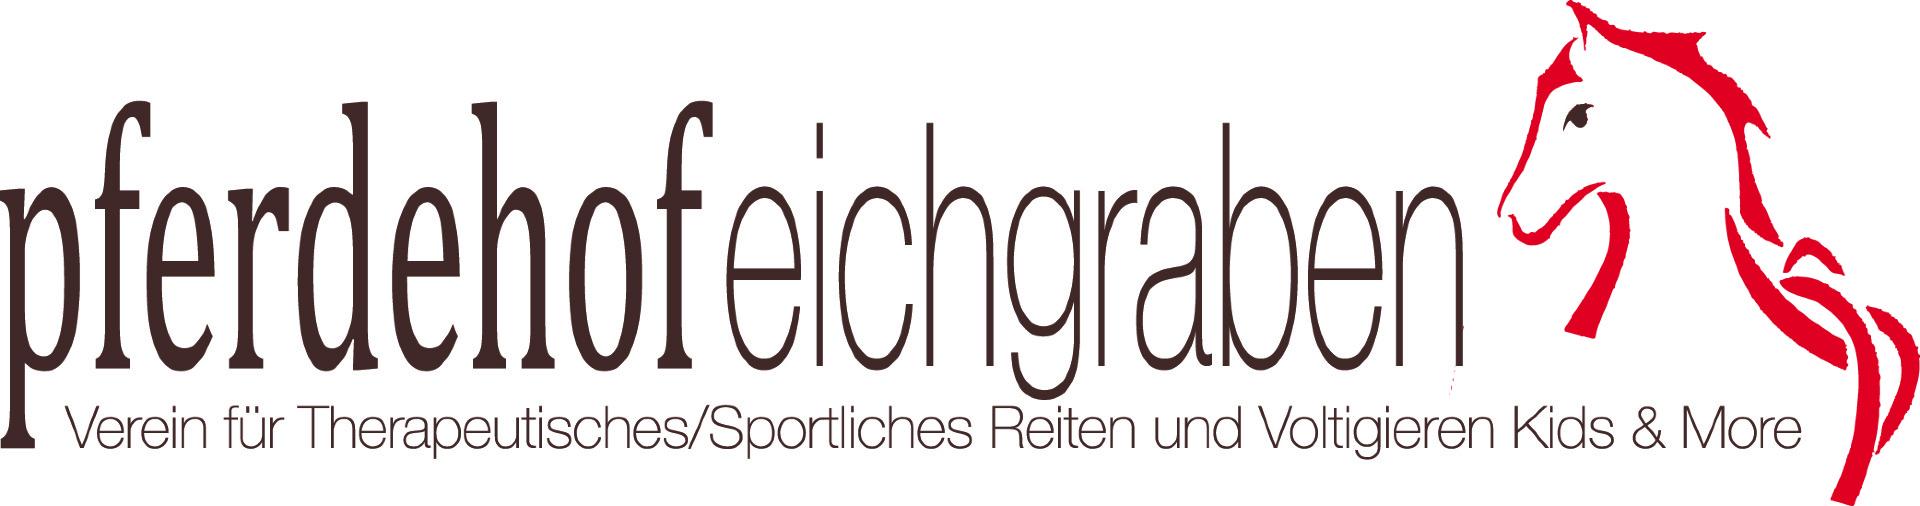 Pferdehof Logoyoutube Rot22